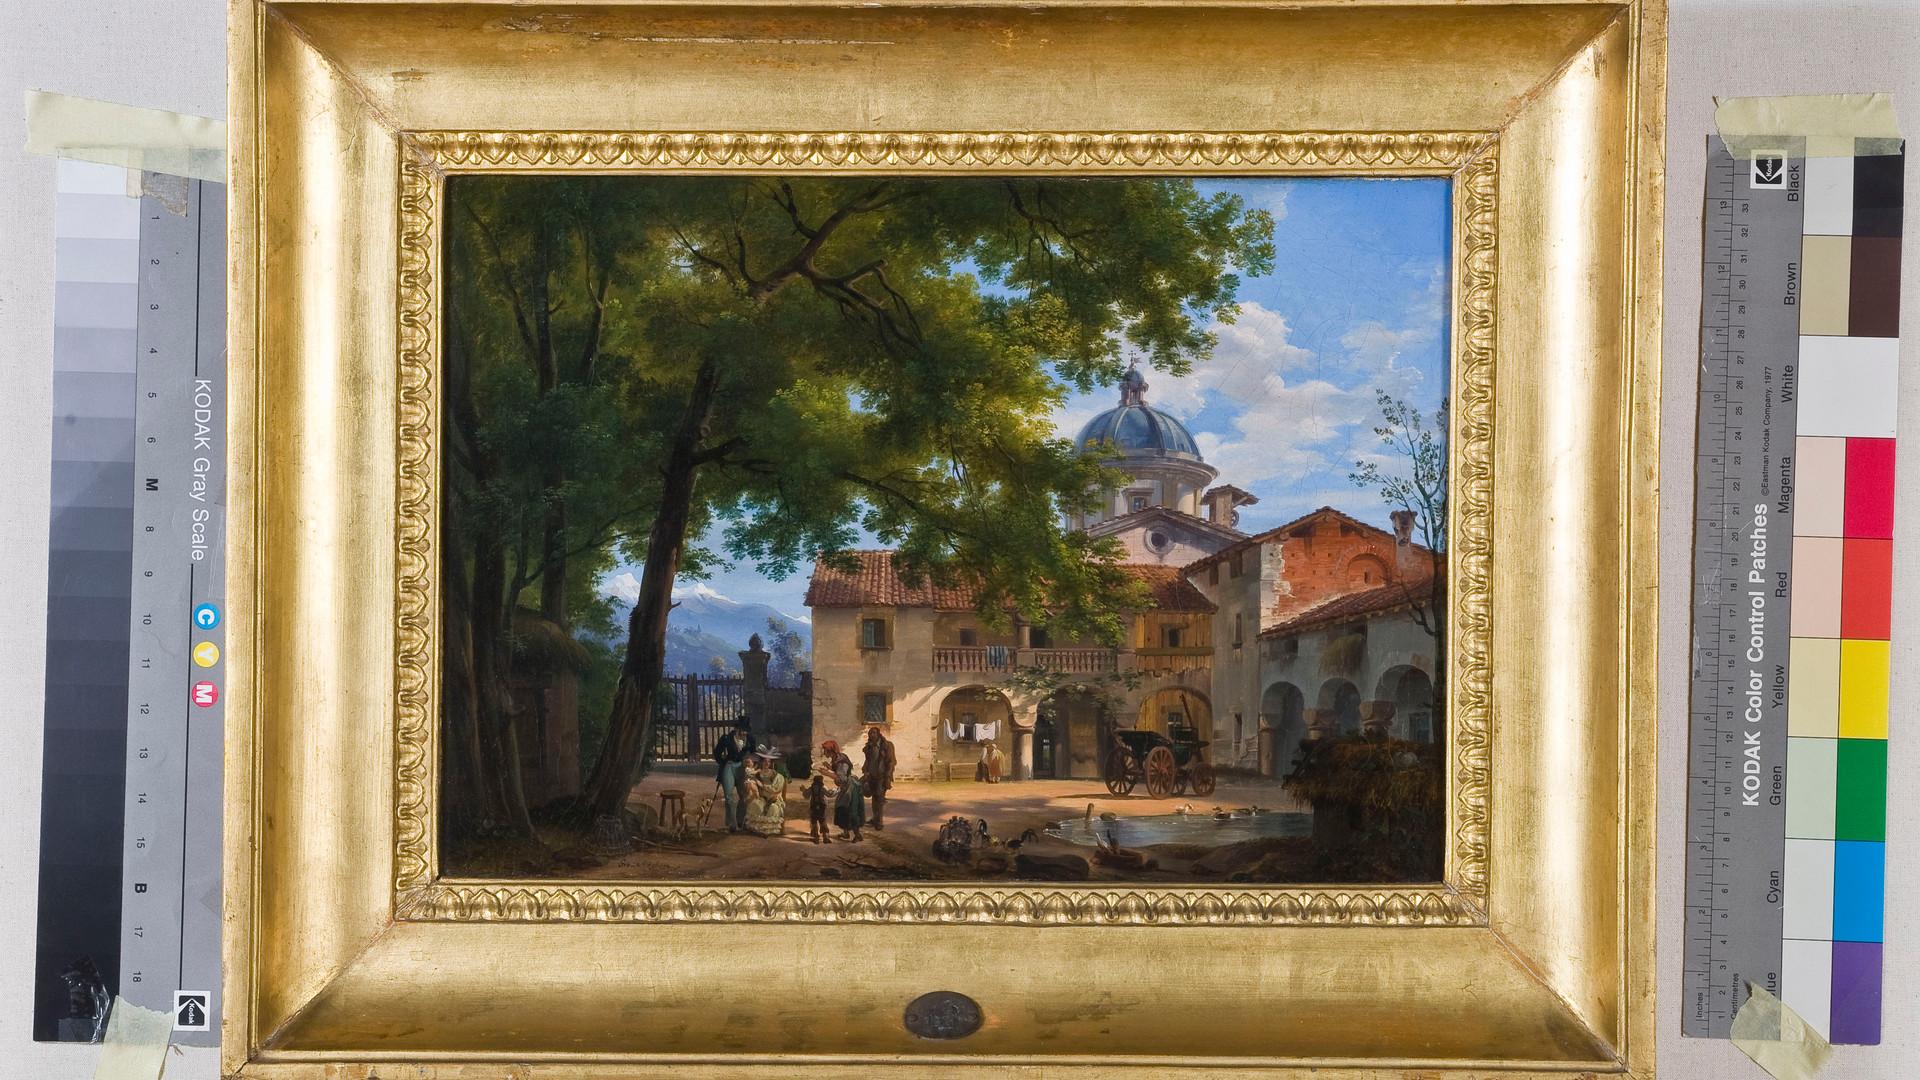 G. Migliara, Sale d'arte Alessandria